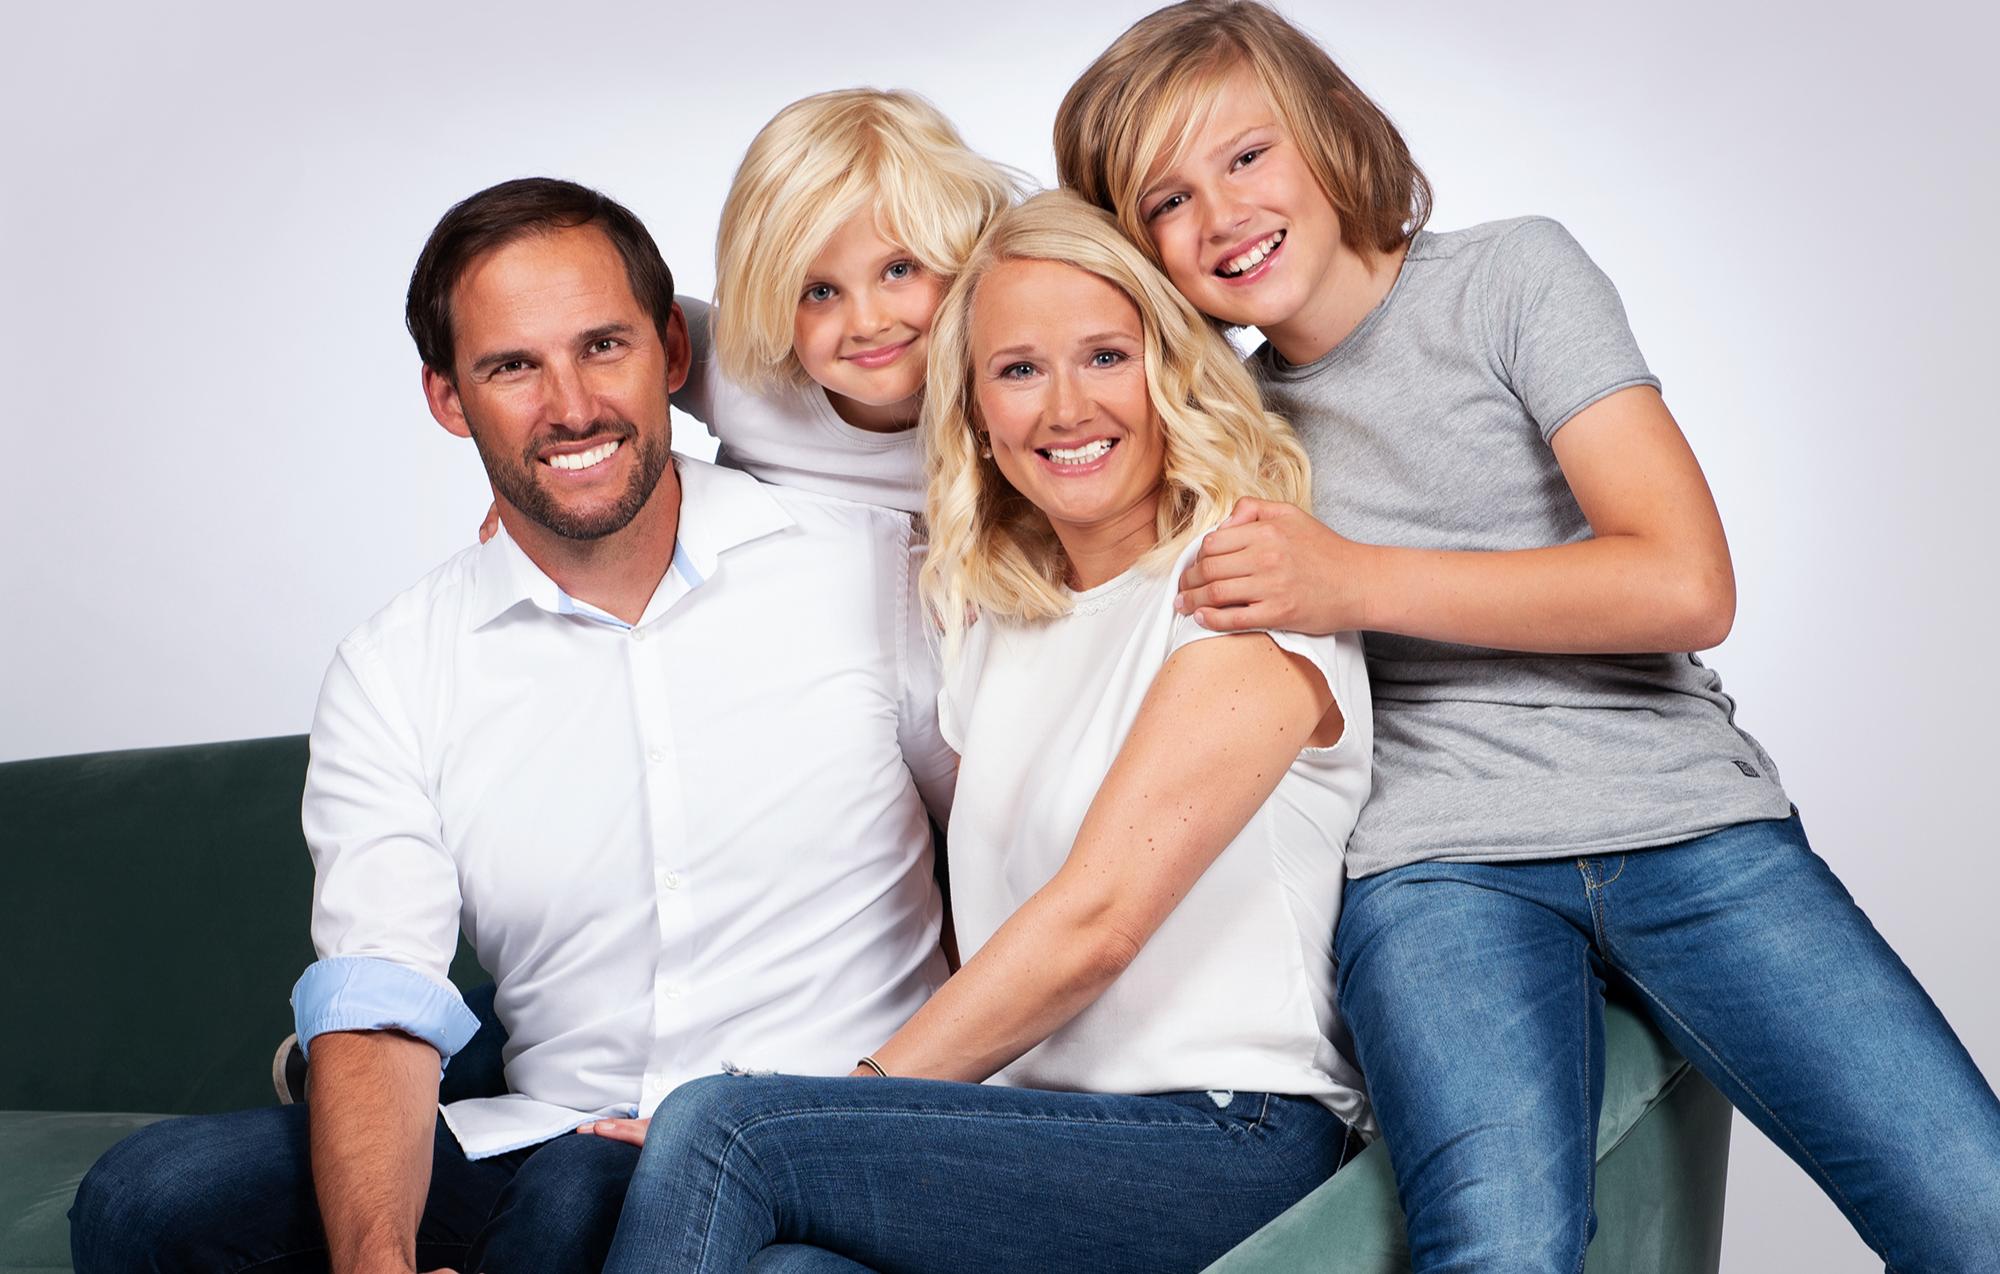 familien-fotoshooting-hamburg-bg31612873147